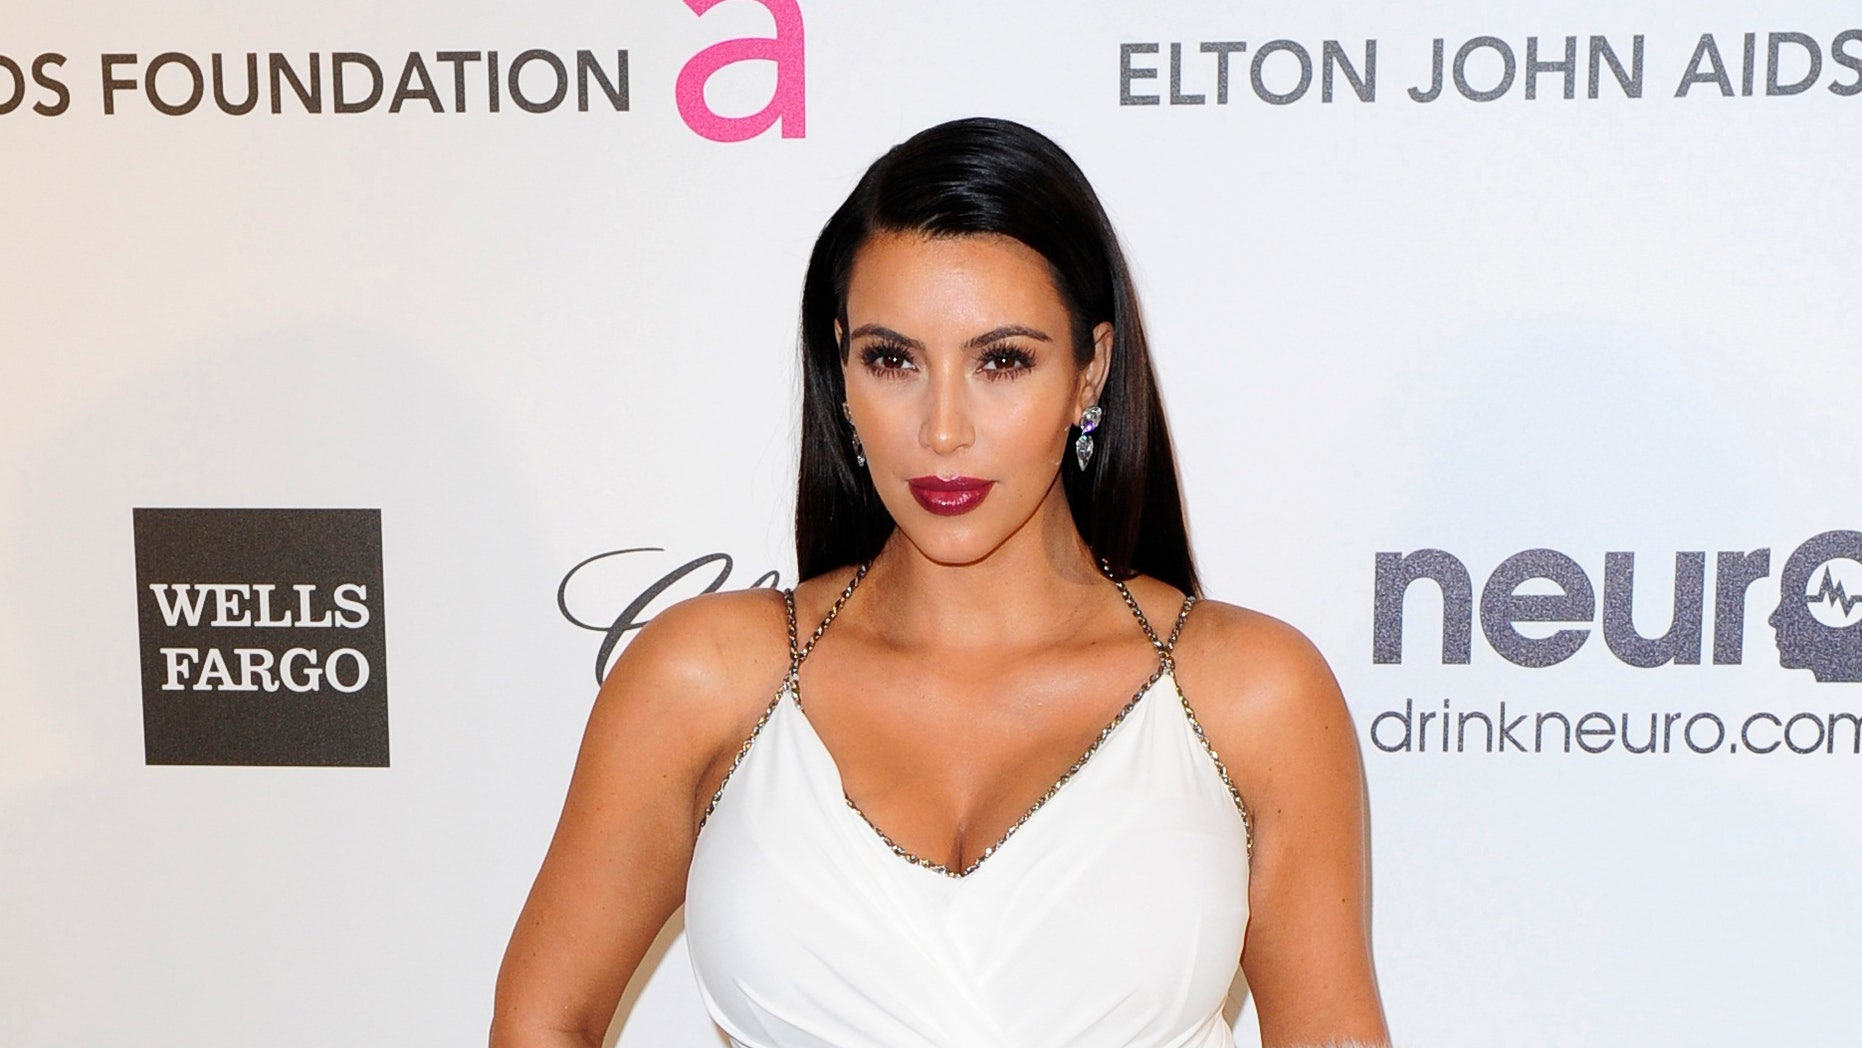 February 24, 2013. TV personality Kim Kardashian arrives at the 2013 Elton John AIDS Foundation Oscar Party in West Hollywood, California.